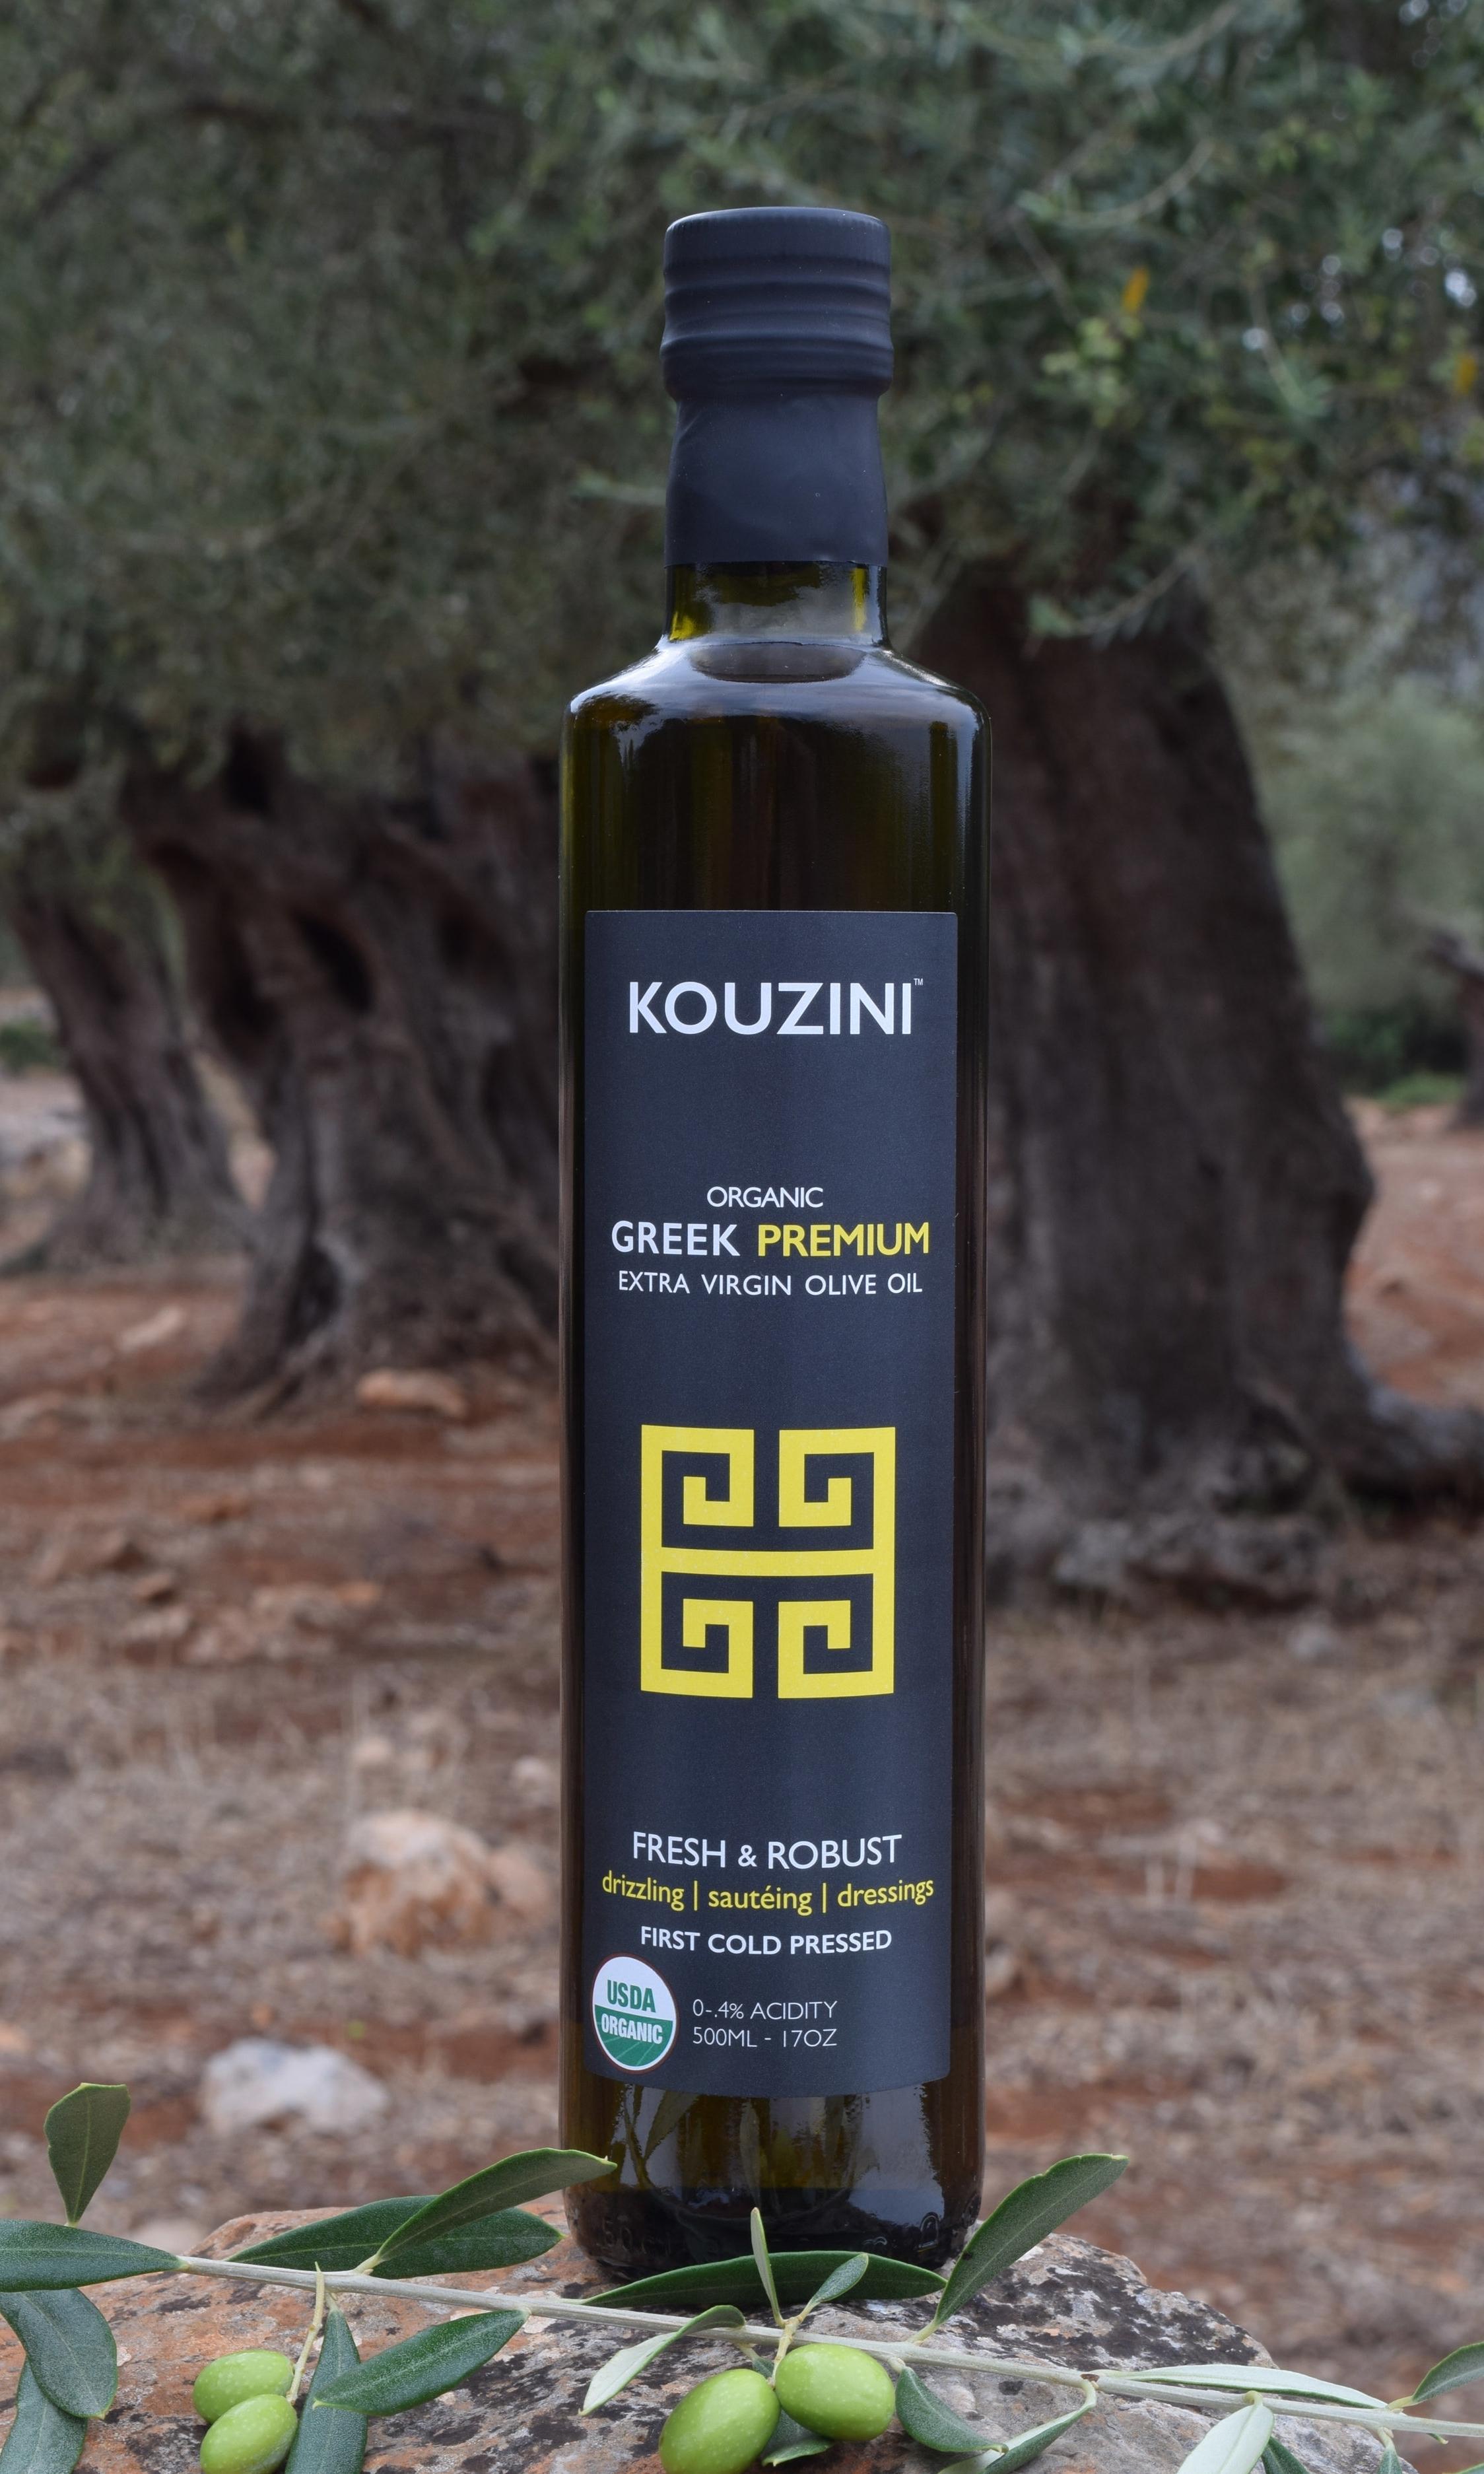 USDA Organic Ultra Premium Greek extra virgin olive oil